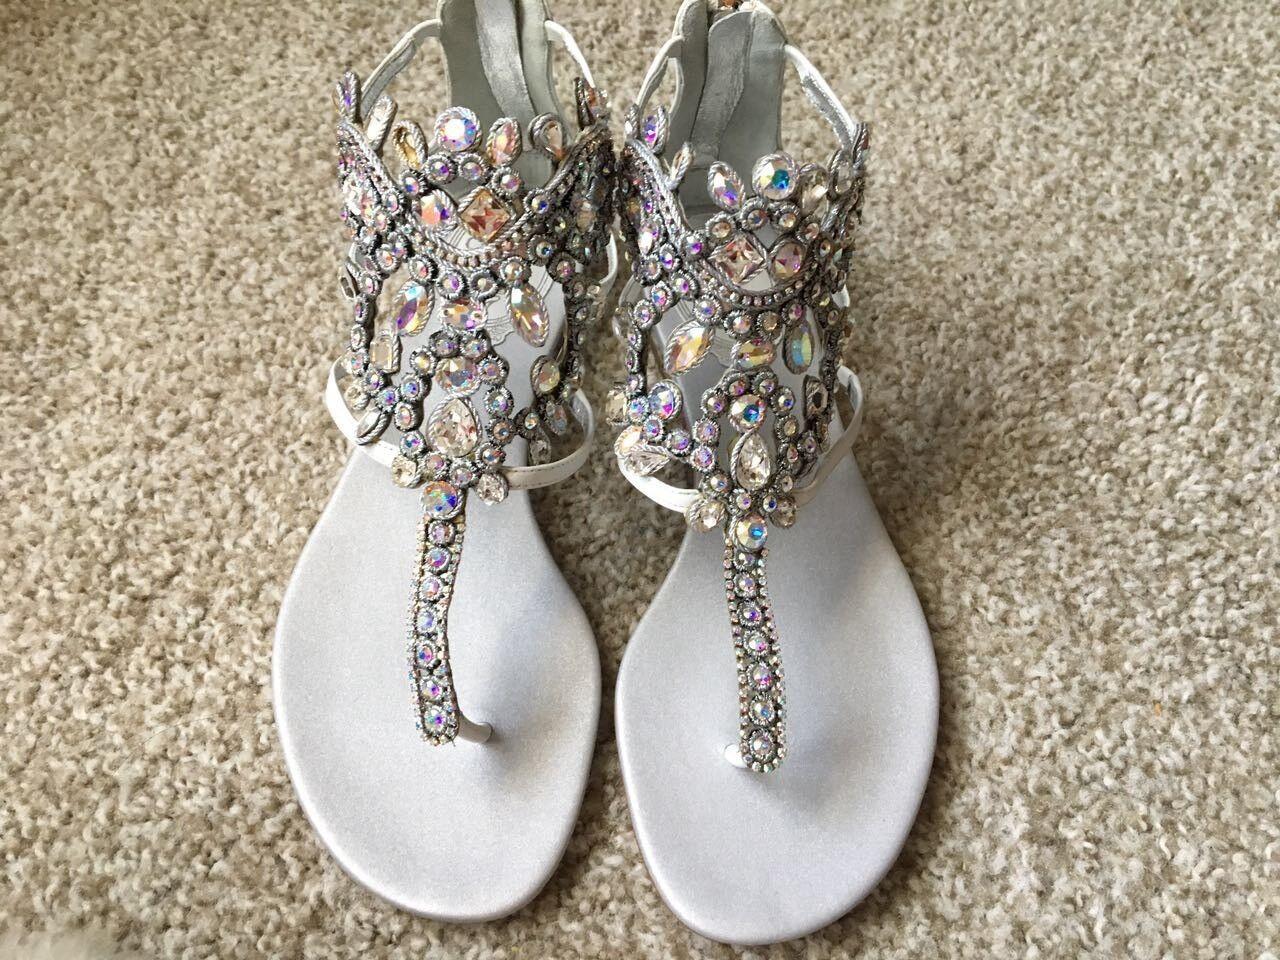 Rene caovilla 10mm Swarovski karung sandals